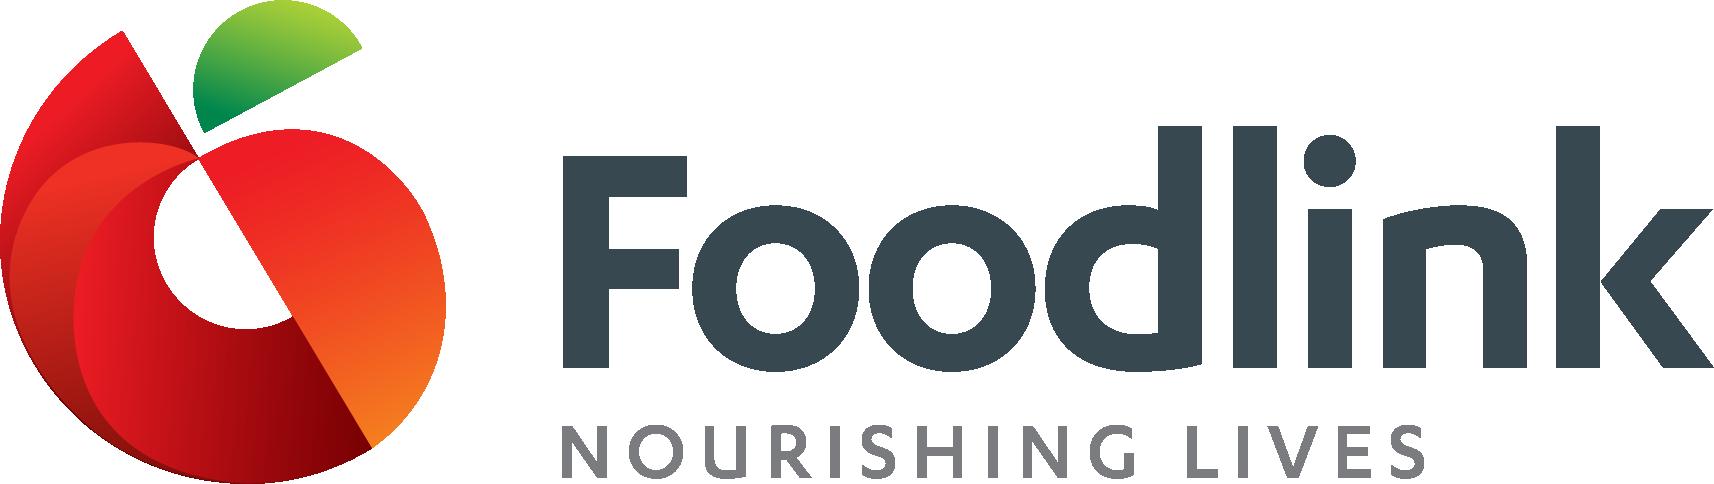 Foodlink, Inc. Company Logo